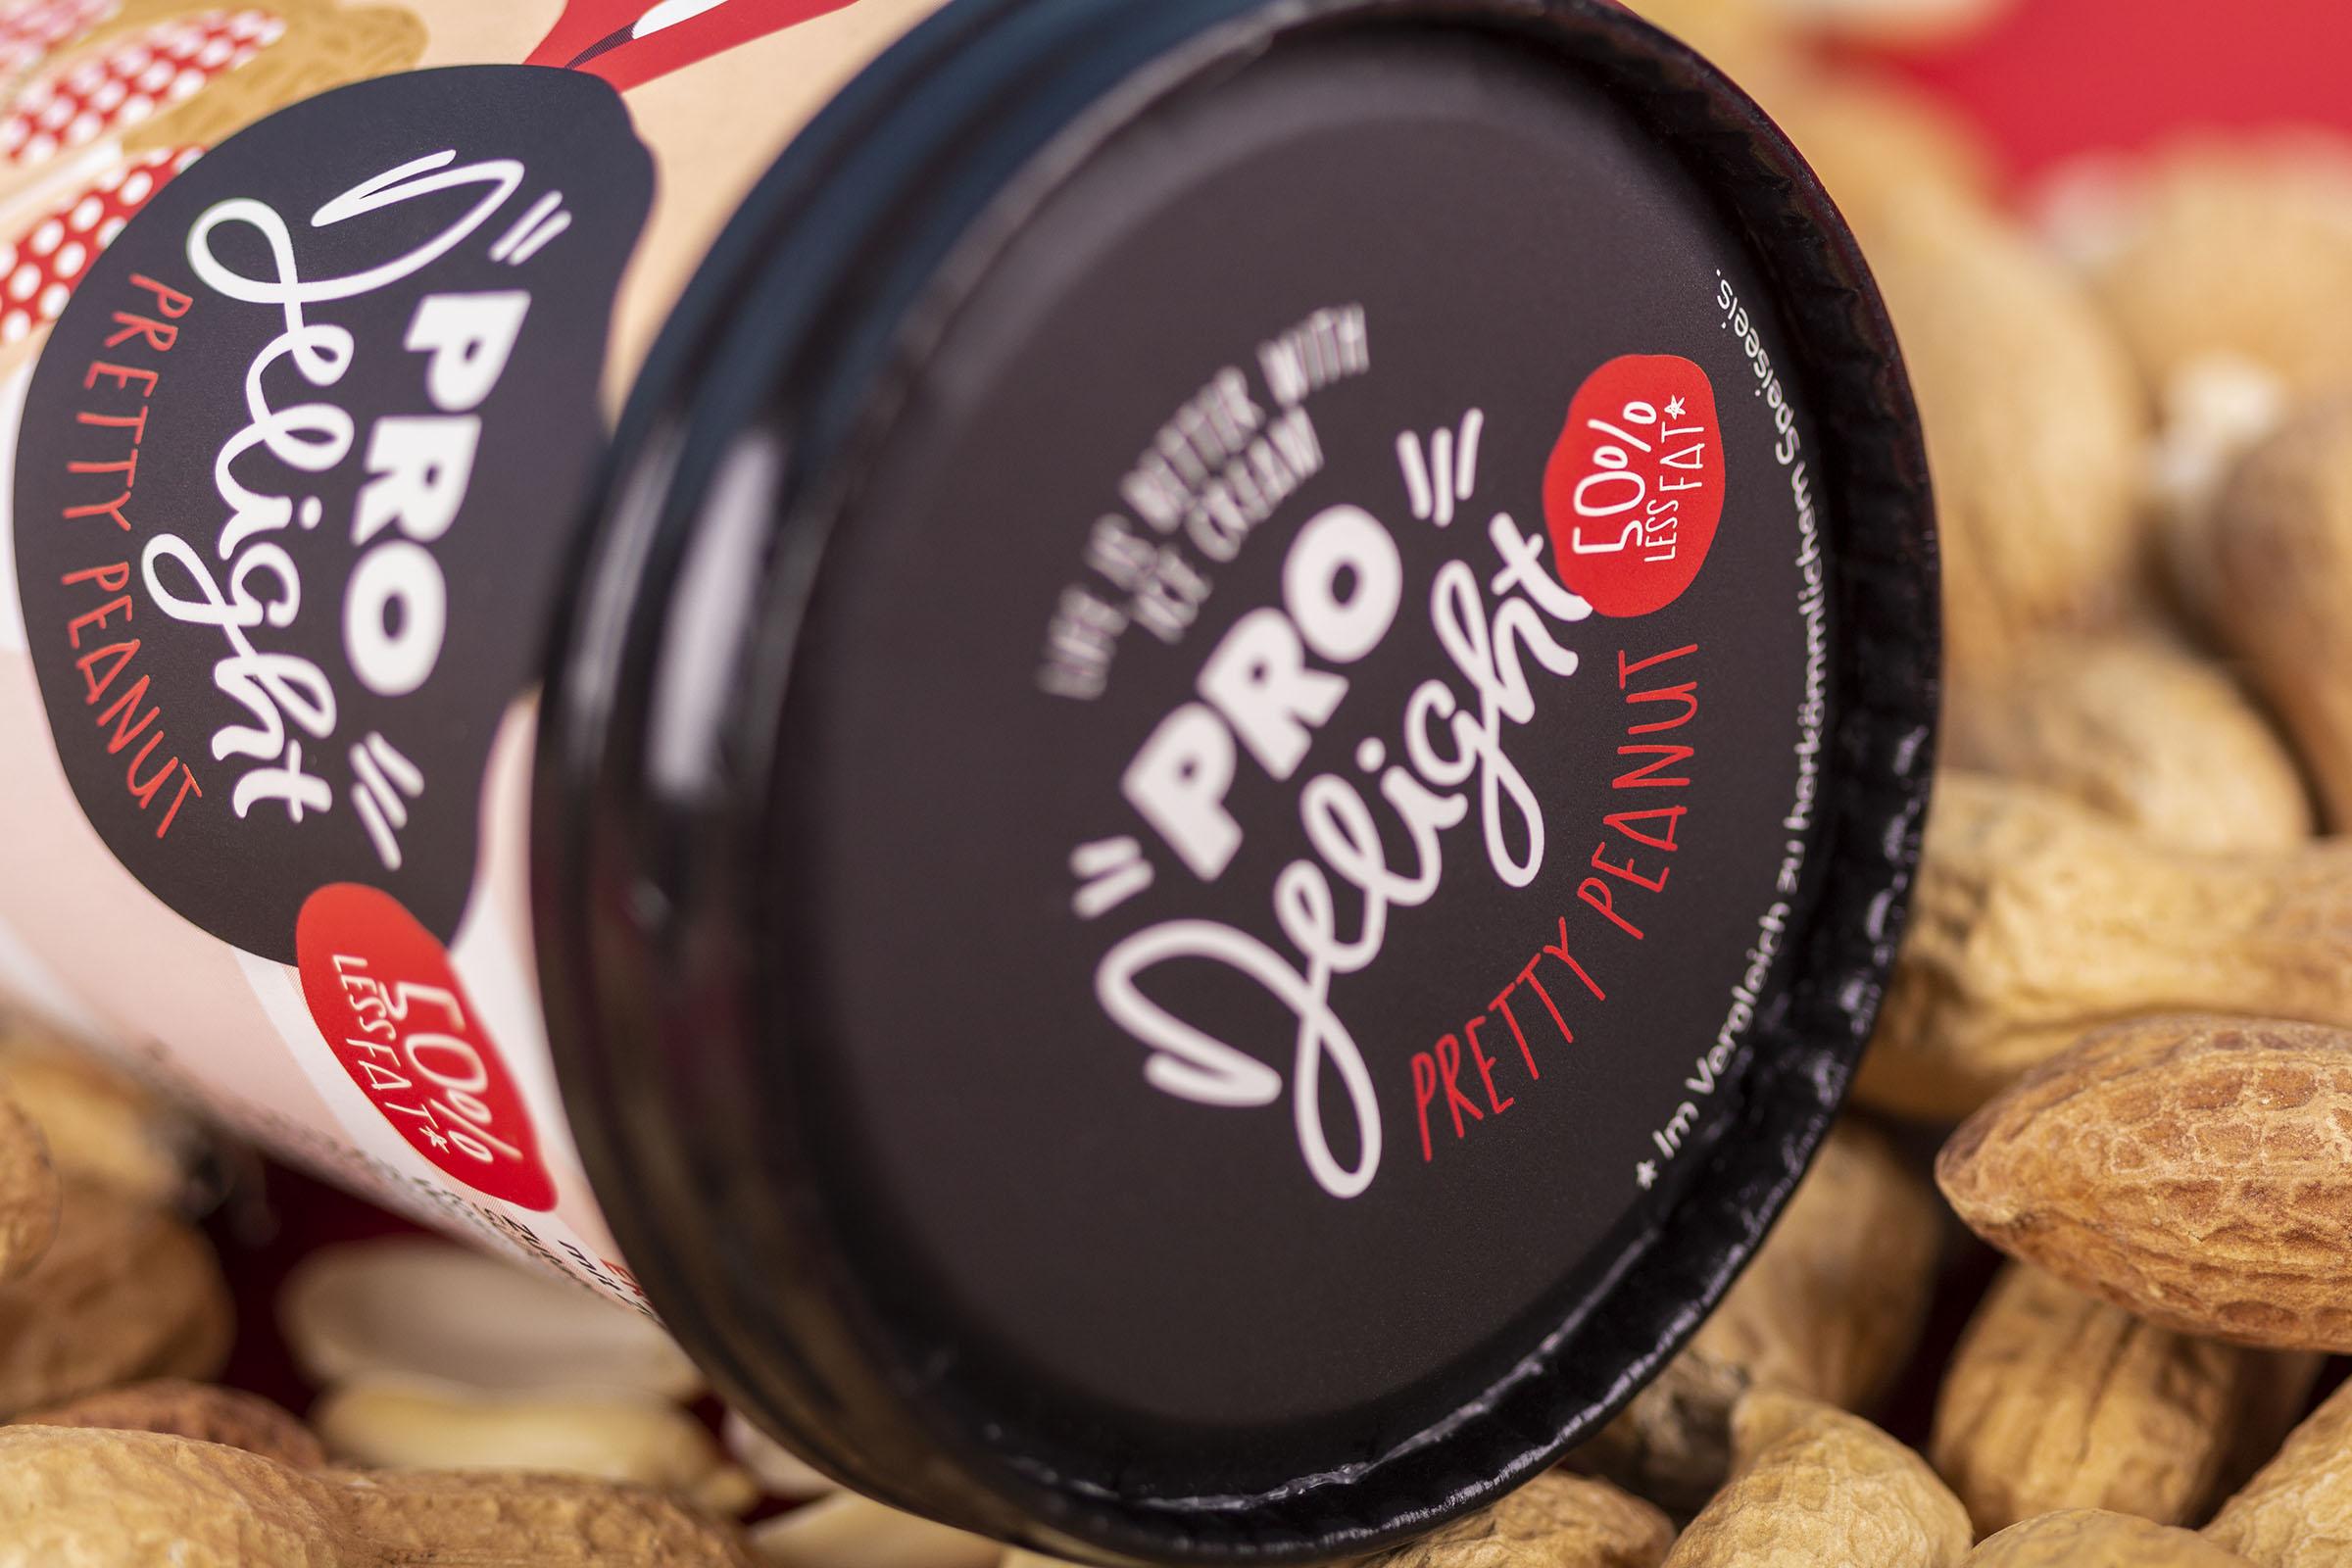 Pro Delight | 果汁咖啡杯子设计插图(4)